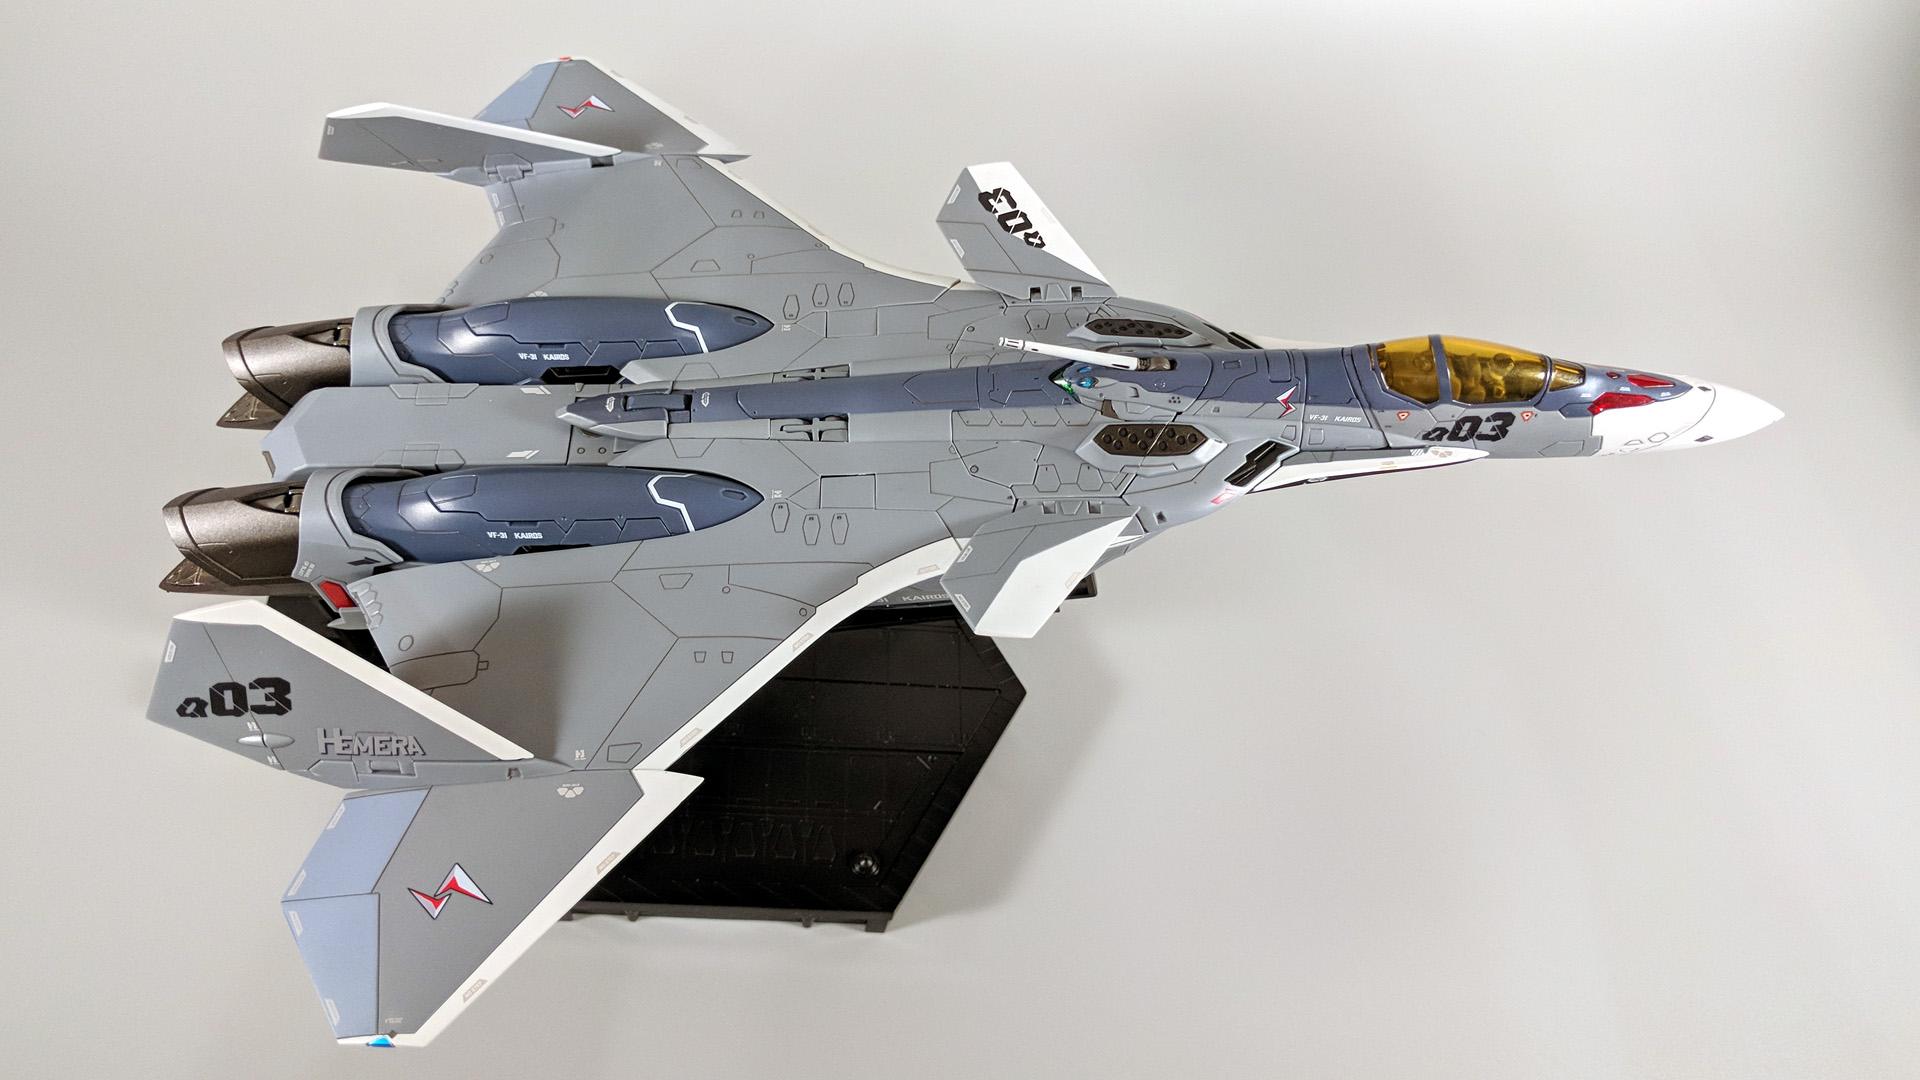 5ac104f00e621_VF-31A19.jpg.b6f22f460ff7a80e949d790b152cf88b.jpg